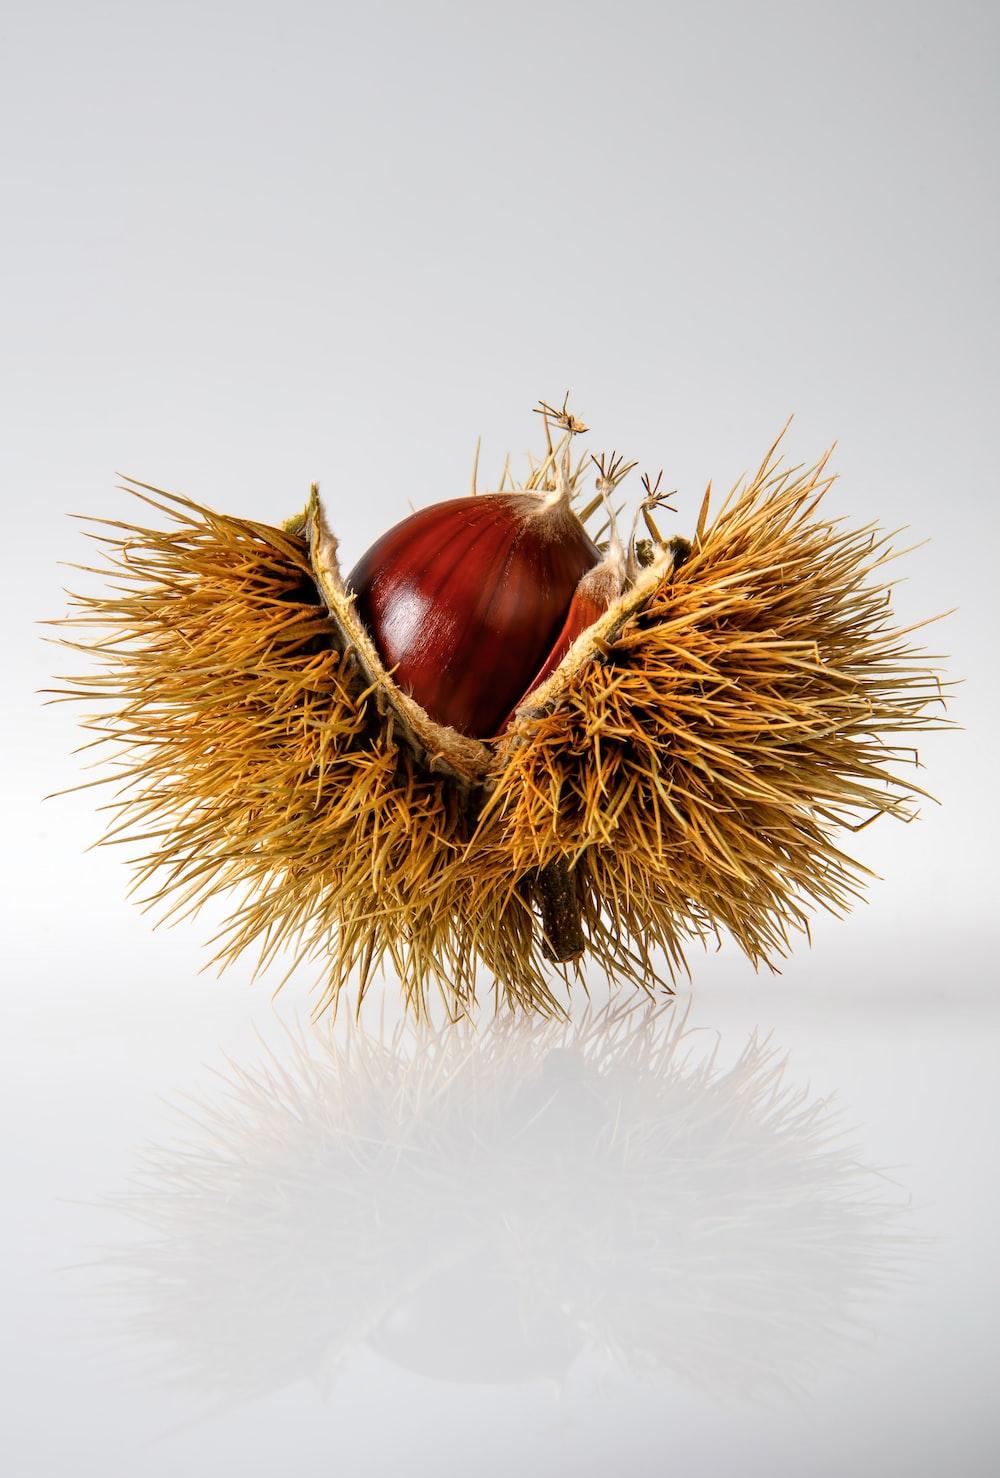 red onion on hays